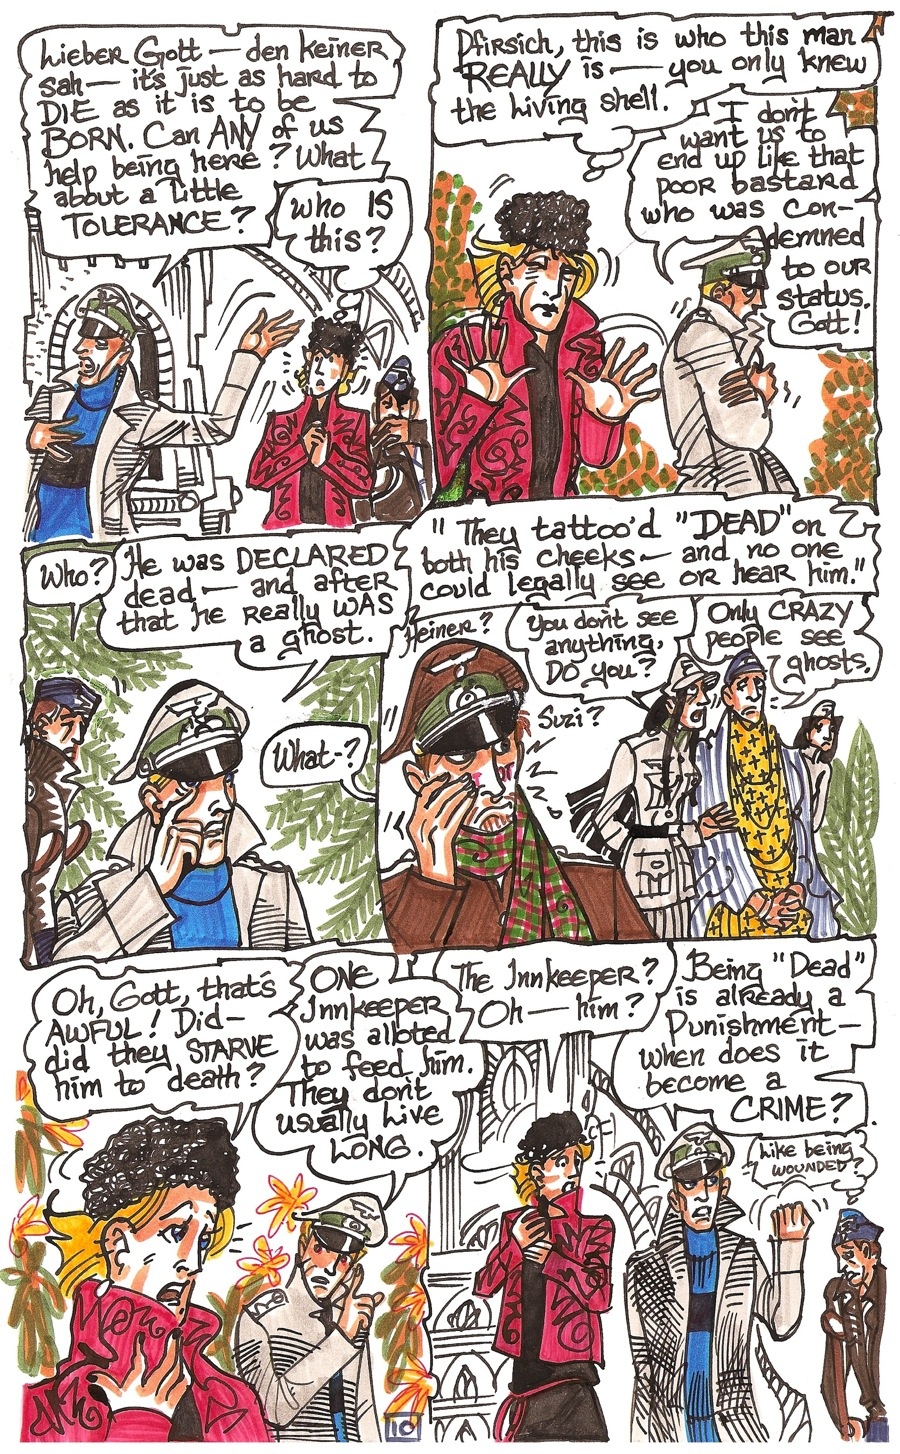 Inauguration, Page 10